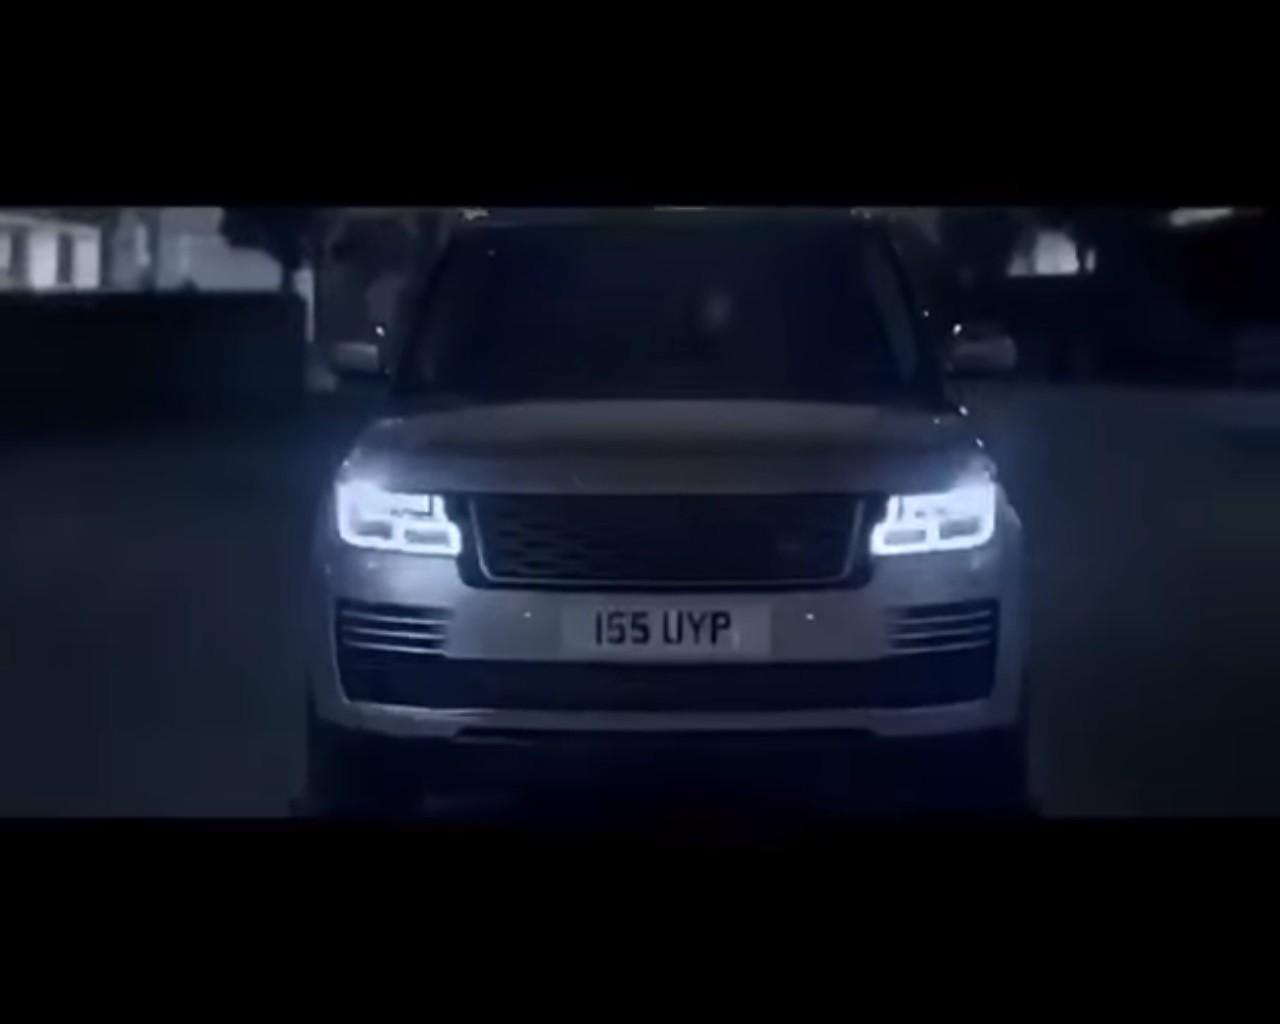 Leak 2018 range rover facelift promo video signals debut for Opus wallpaper range